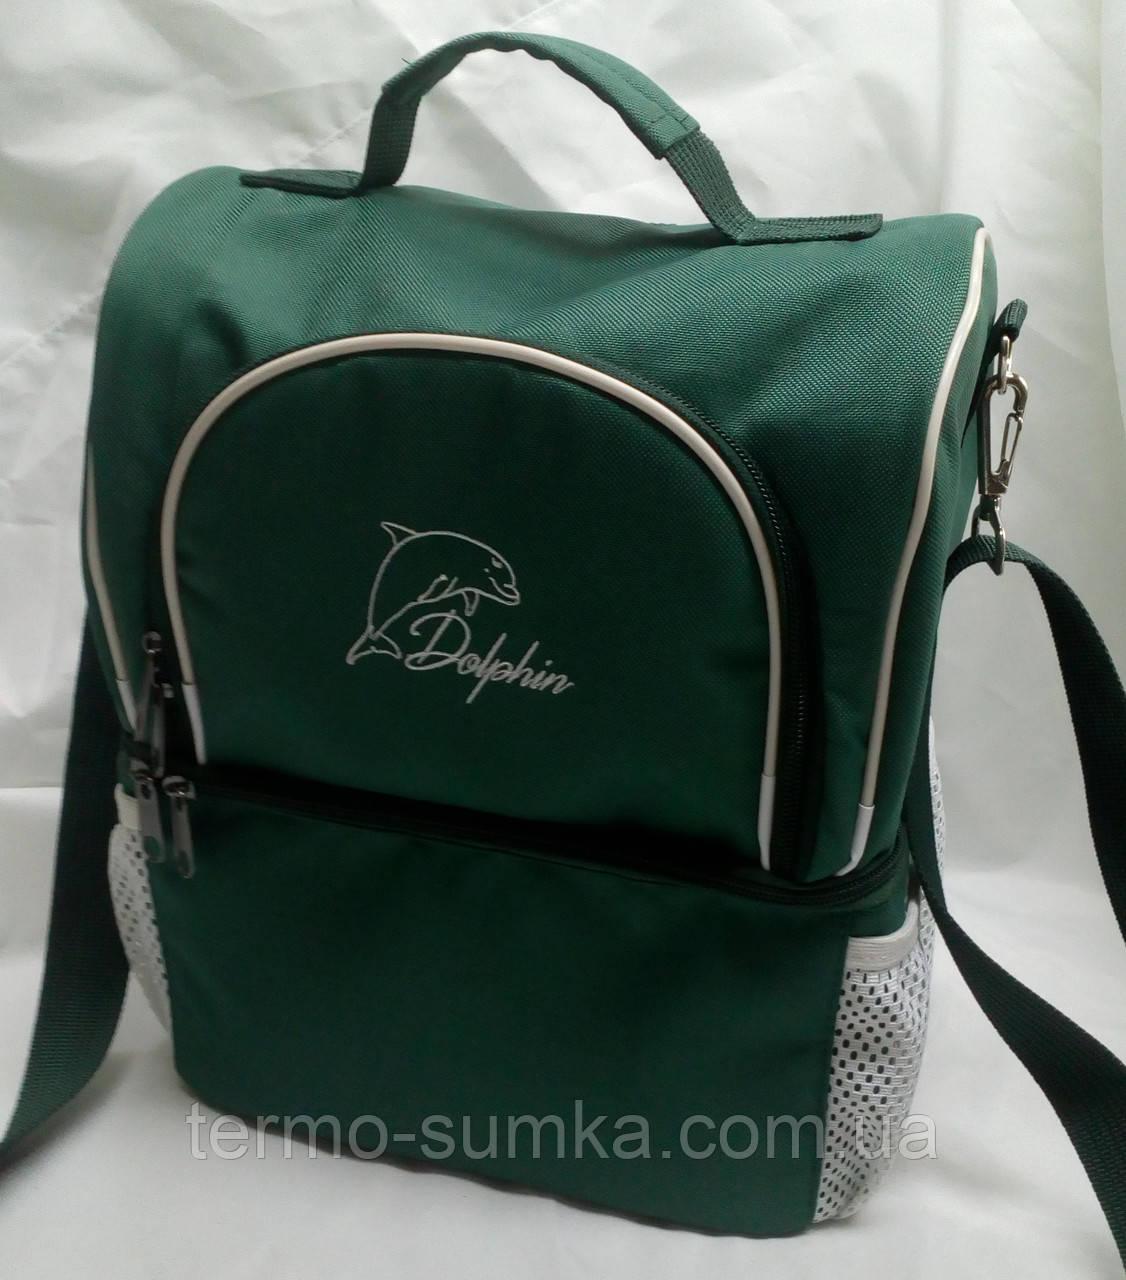 Ланч бокс Dolphin, термосумка - рюкзак для їжі, ланч бег, терморюкзак для обіду, сумка холодильник. Зелений